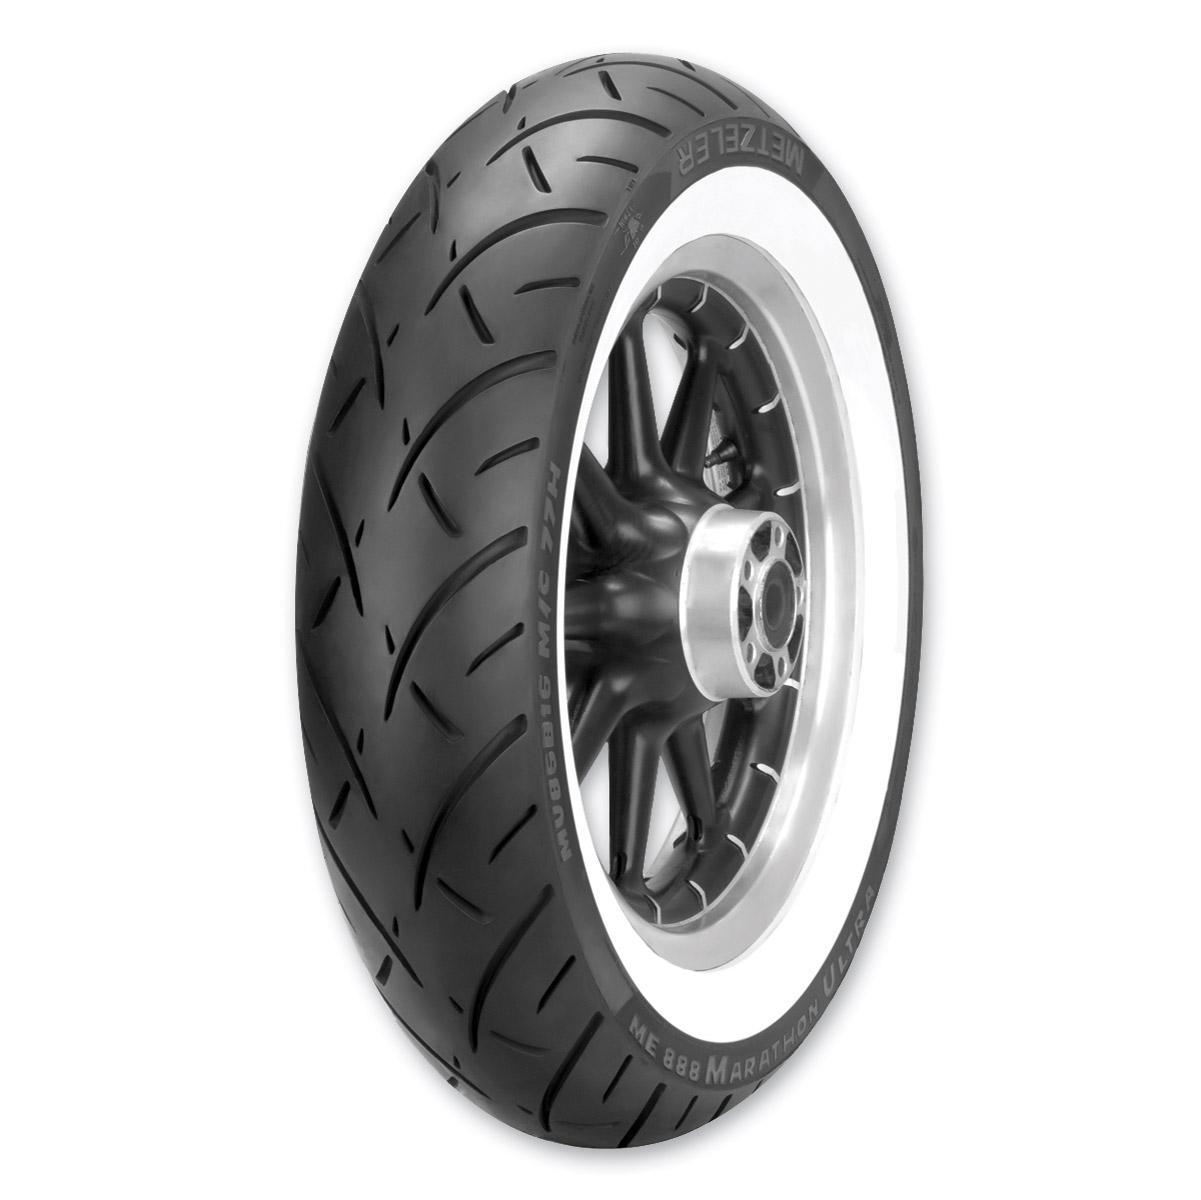 Metzeler ME888 Marathon Ultra 180/65B16 Wide Whitewall Rear Tire